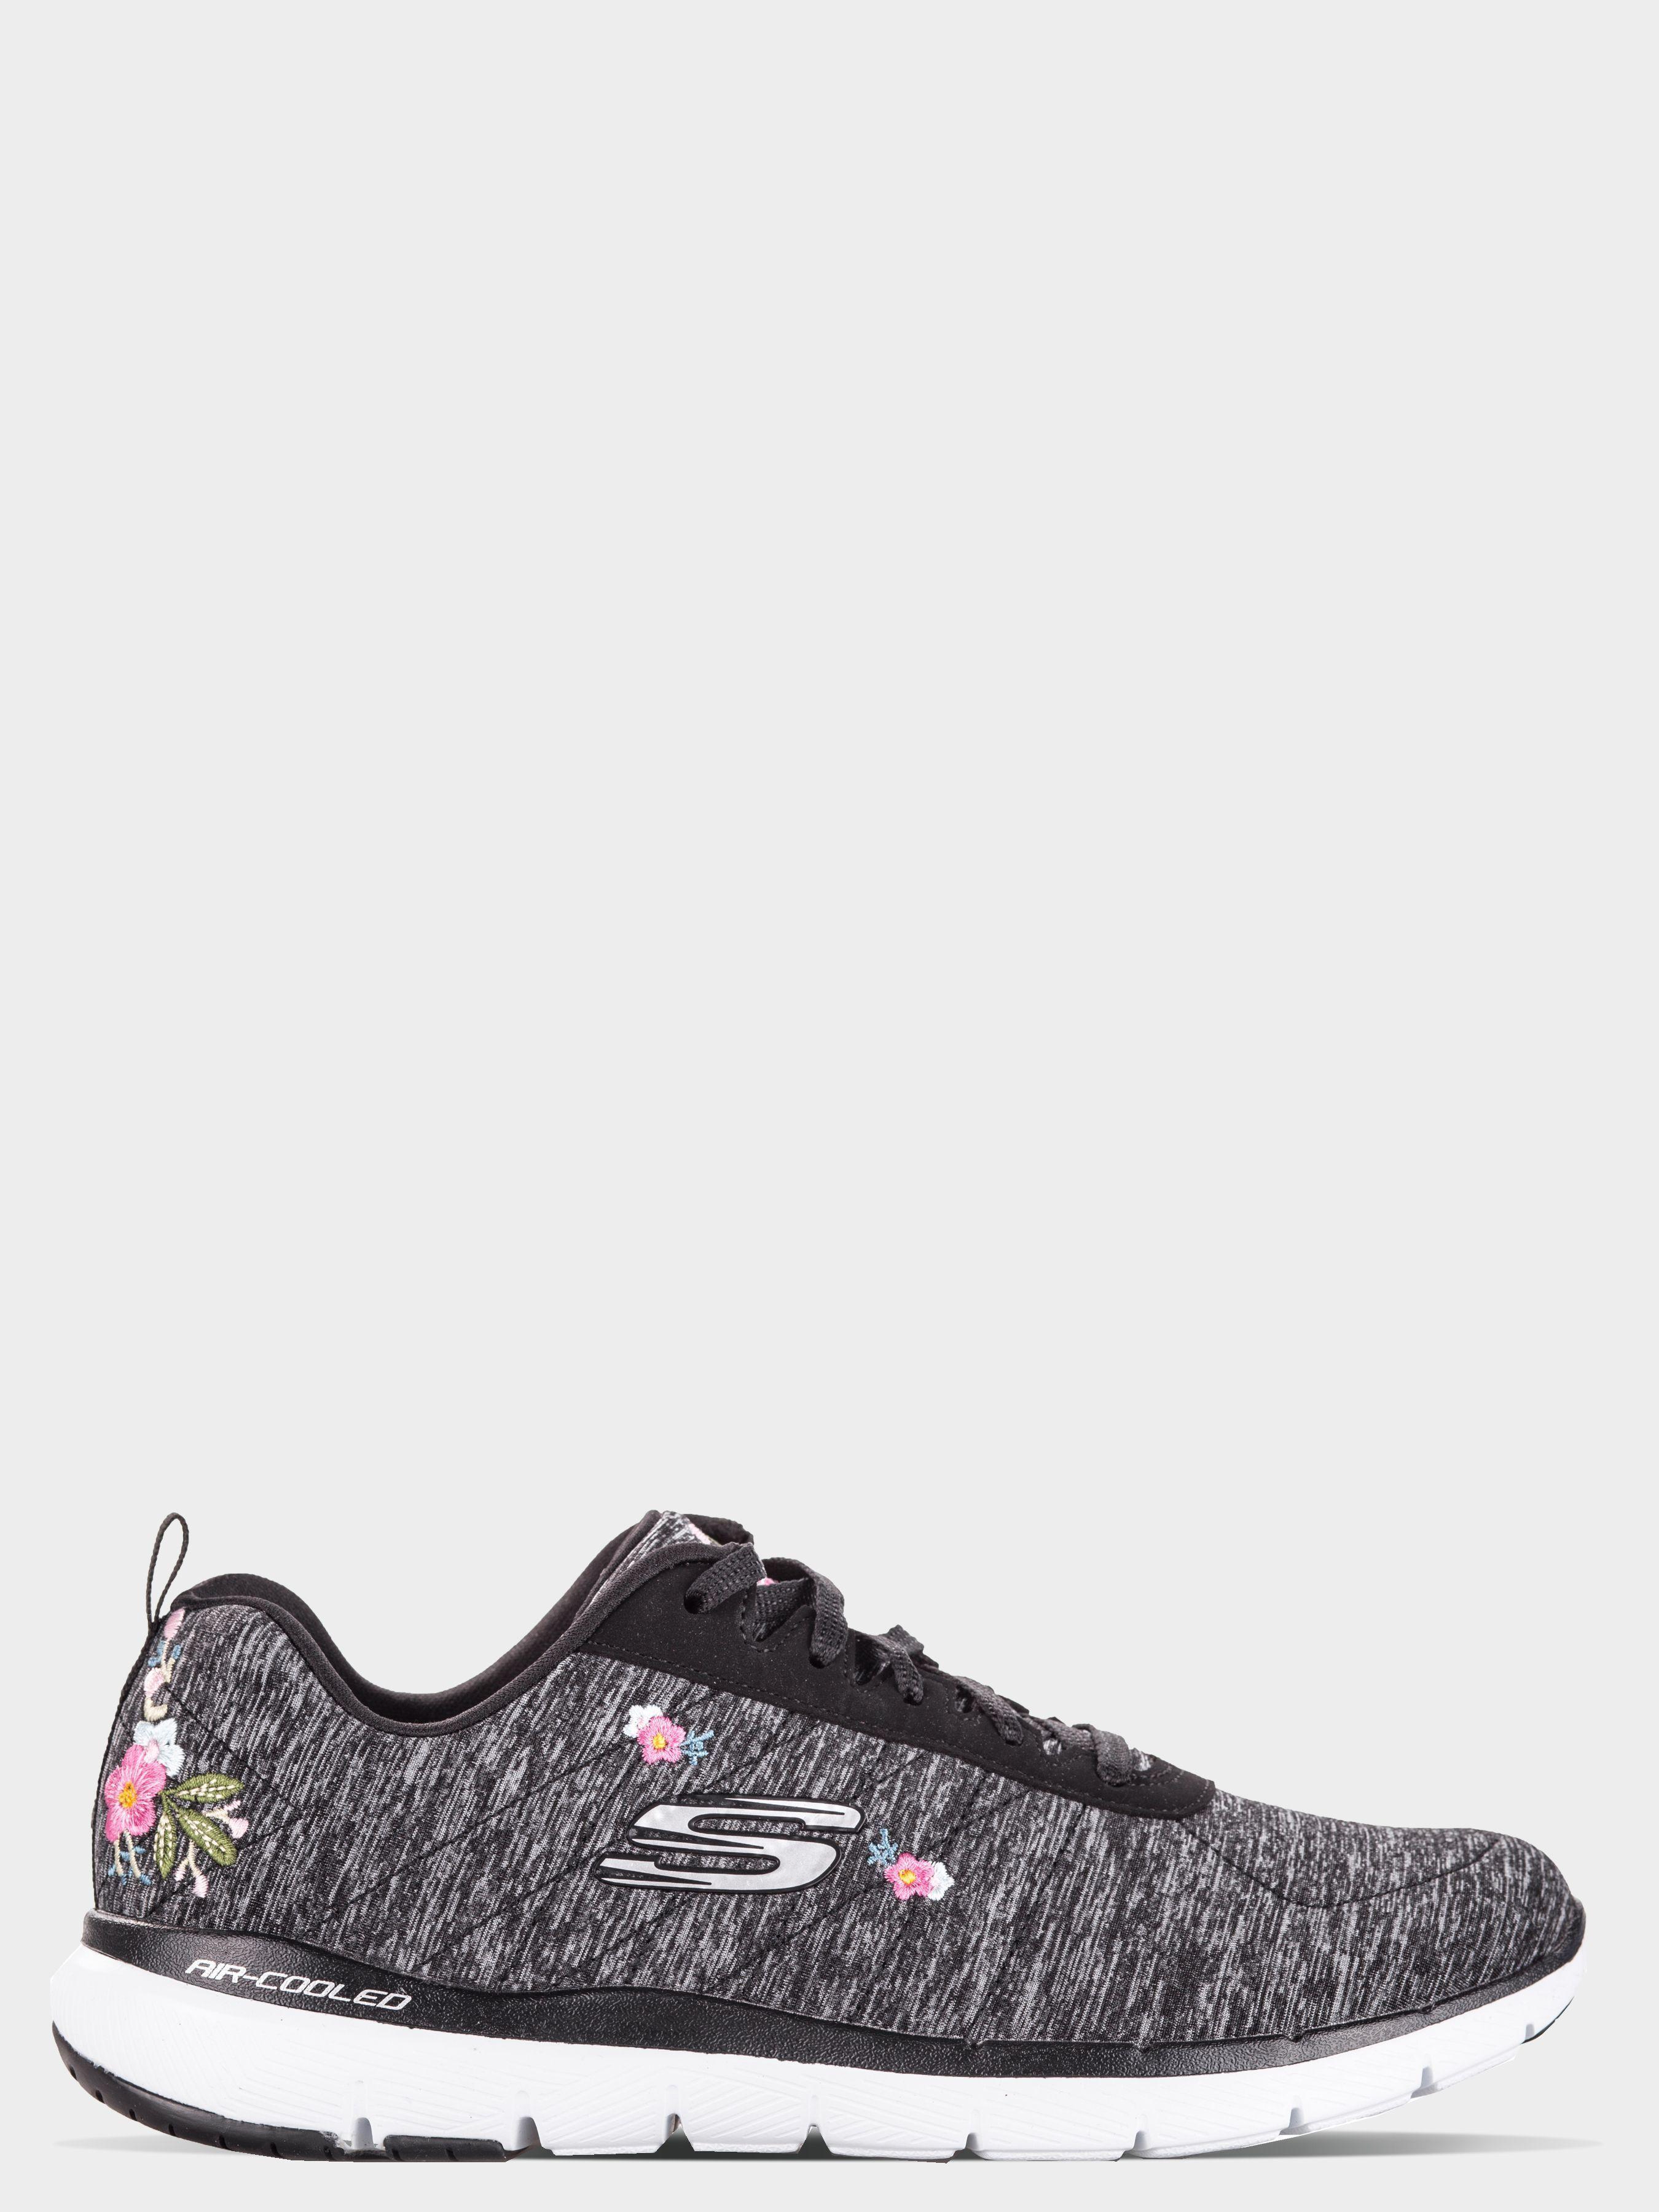 Кроссовки для женщин Skechers KW4946 продажа, 2017